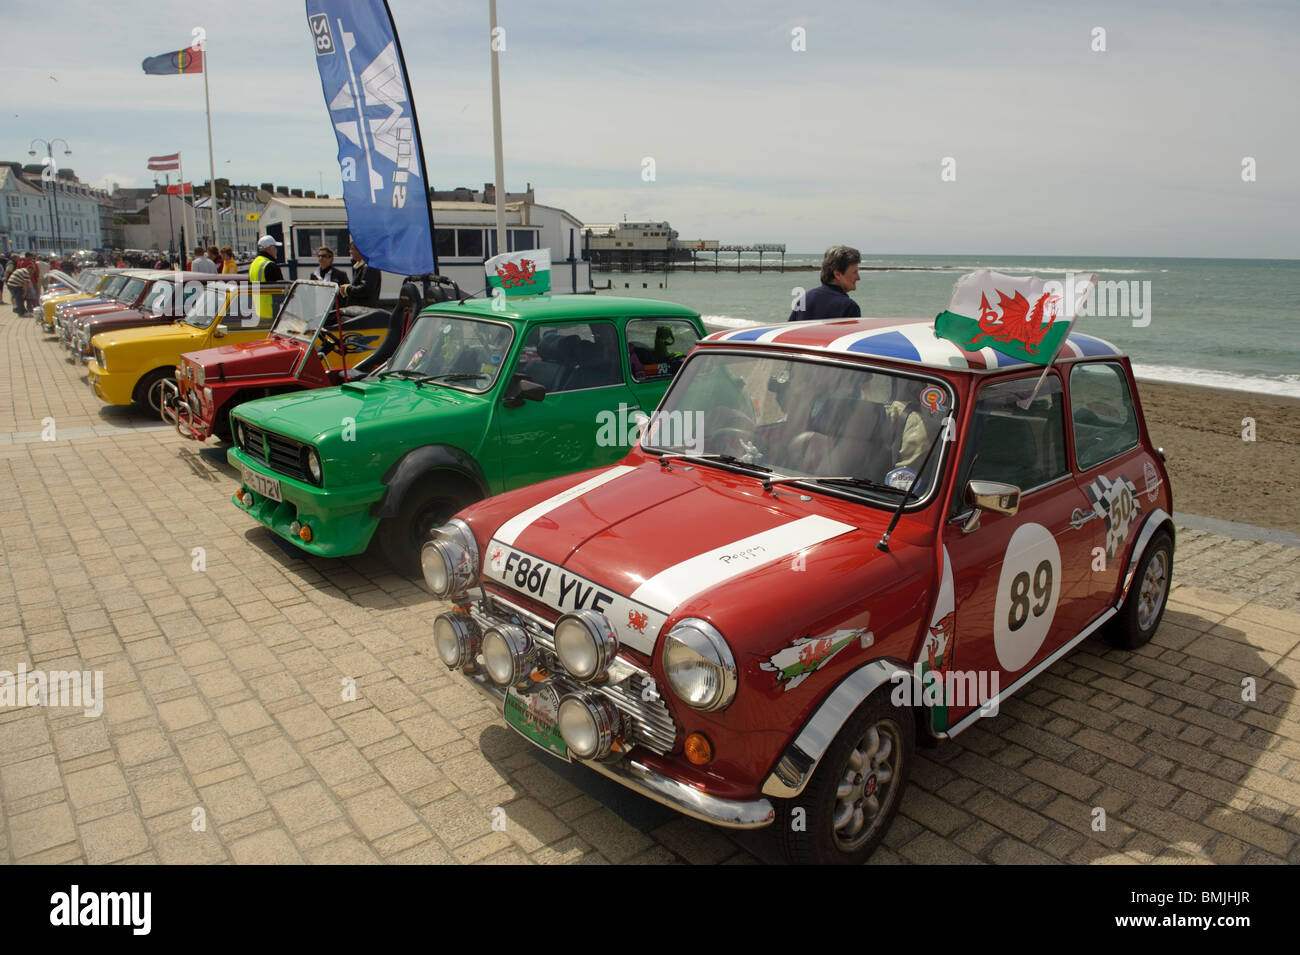 Mini Rally Car Stock Photos & Mini Rally Car Stock Images - Alamy